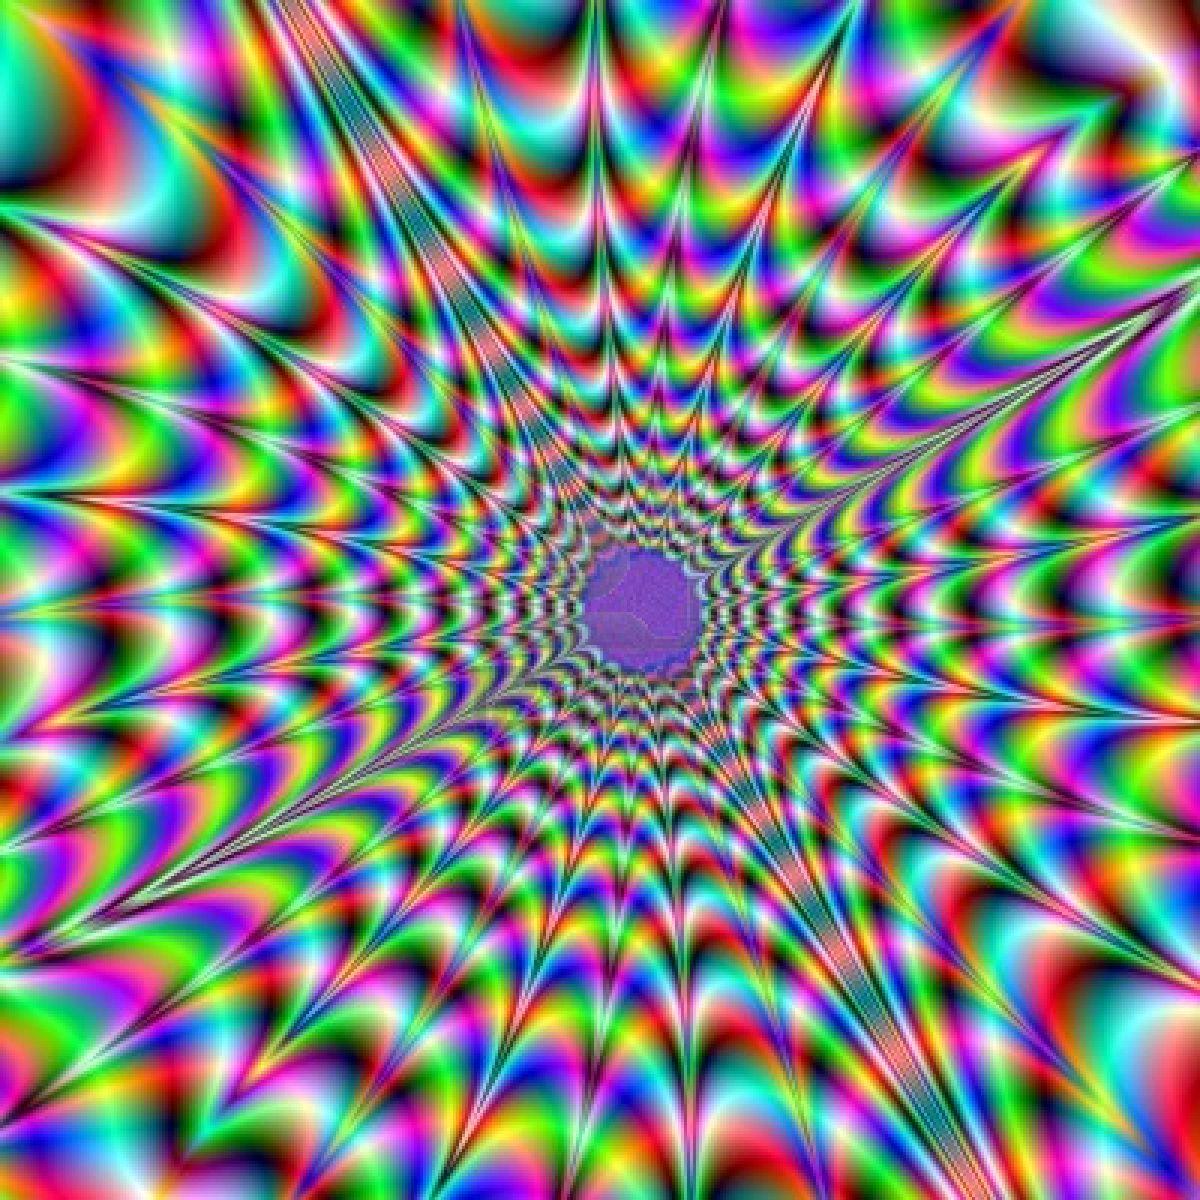 moving wallpapers moving wallpapers moving hd wallpapers moving hd 1200x1200